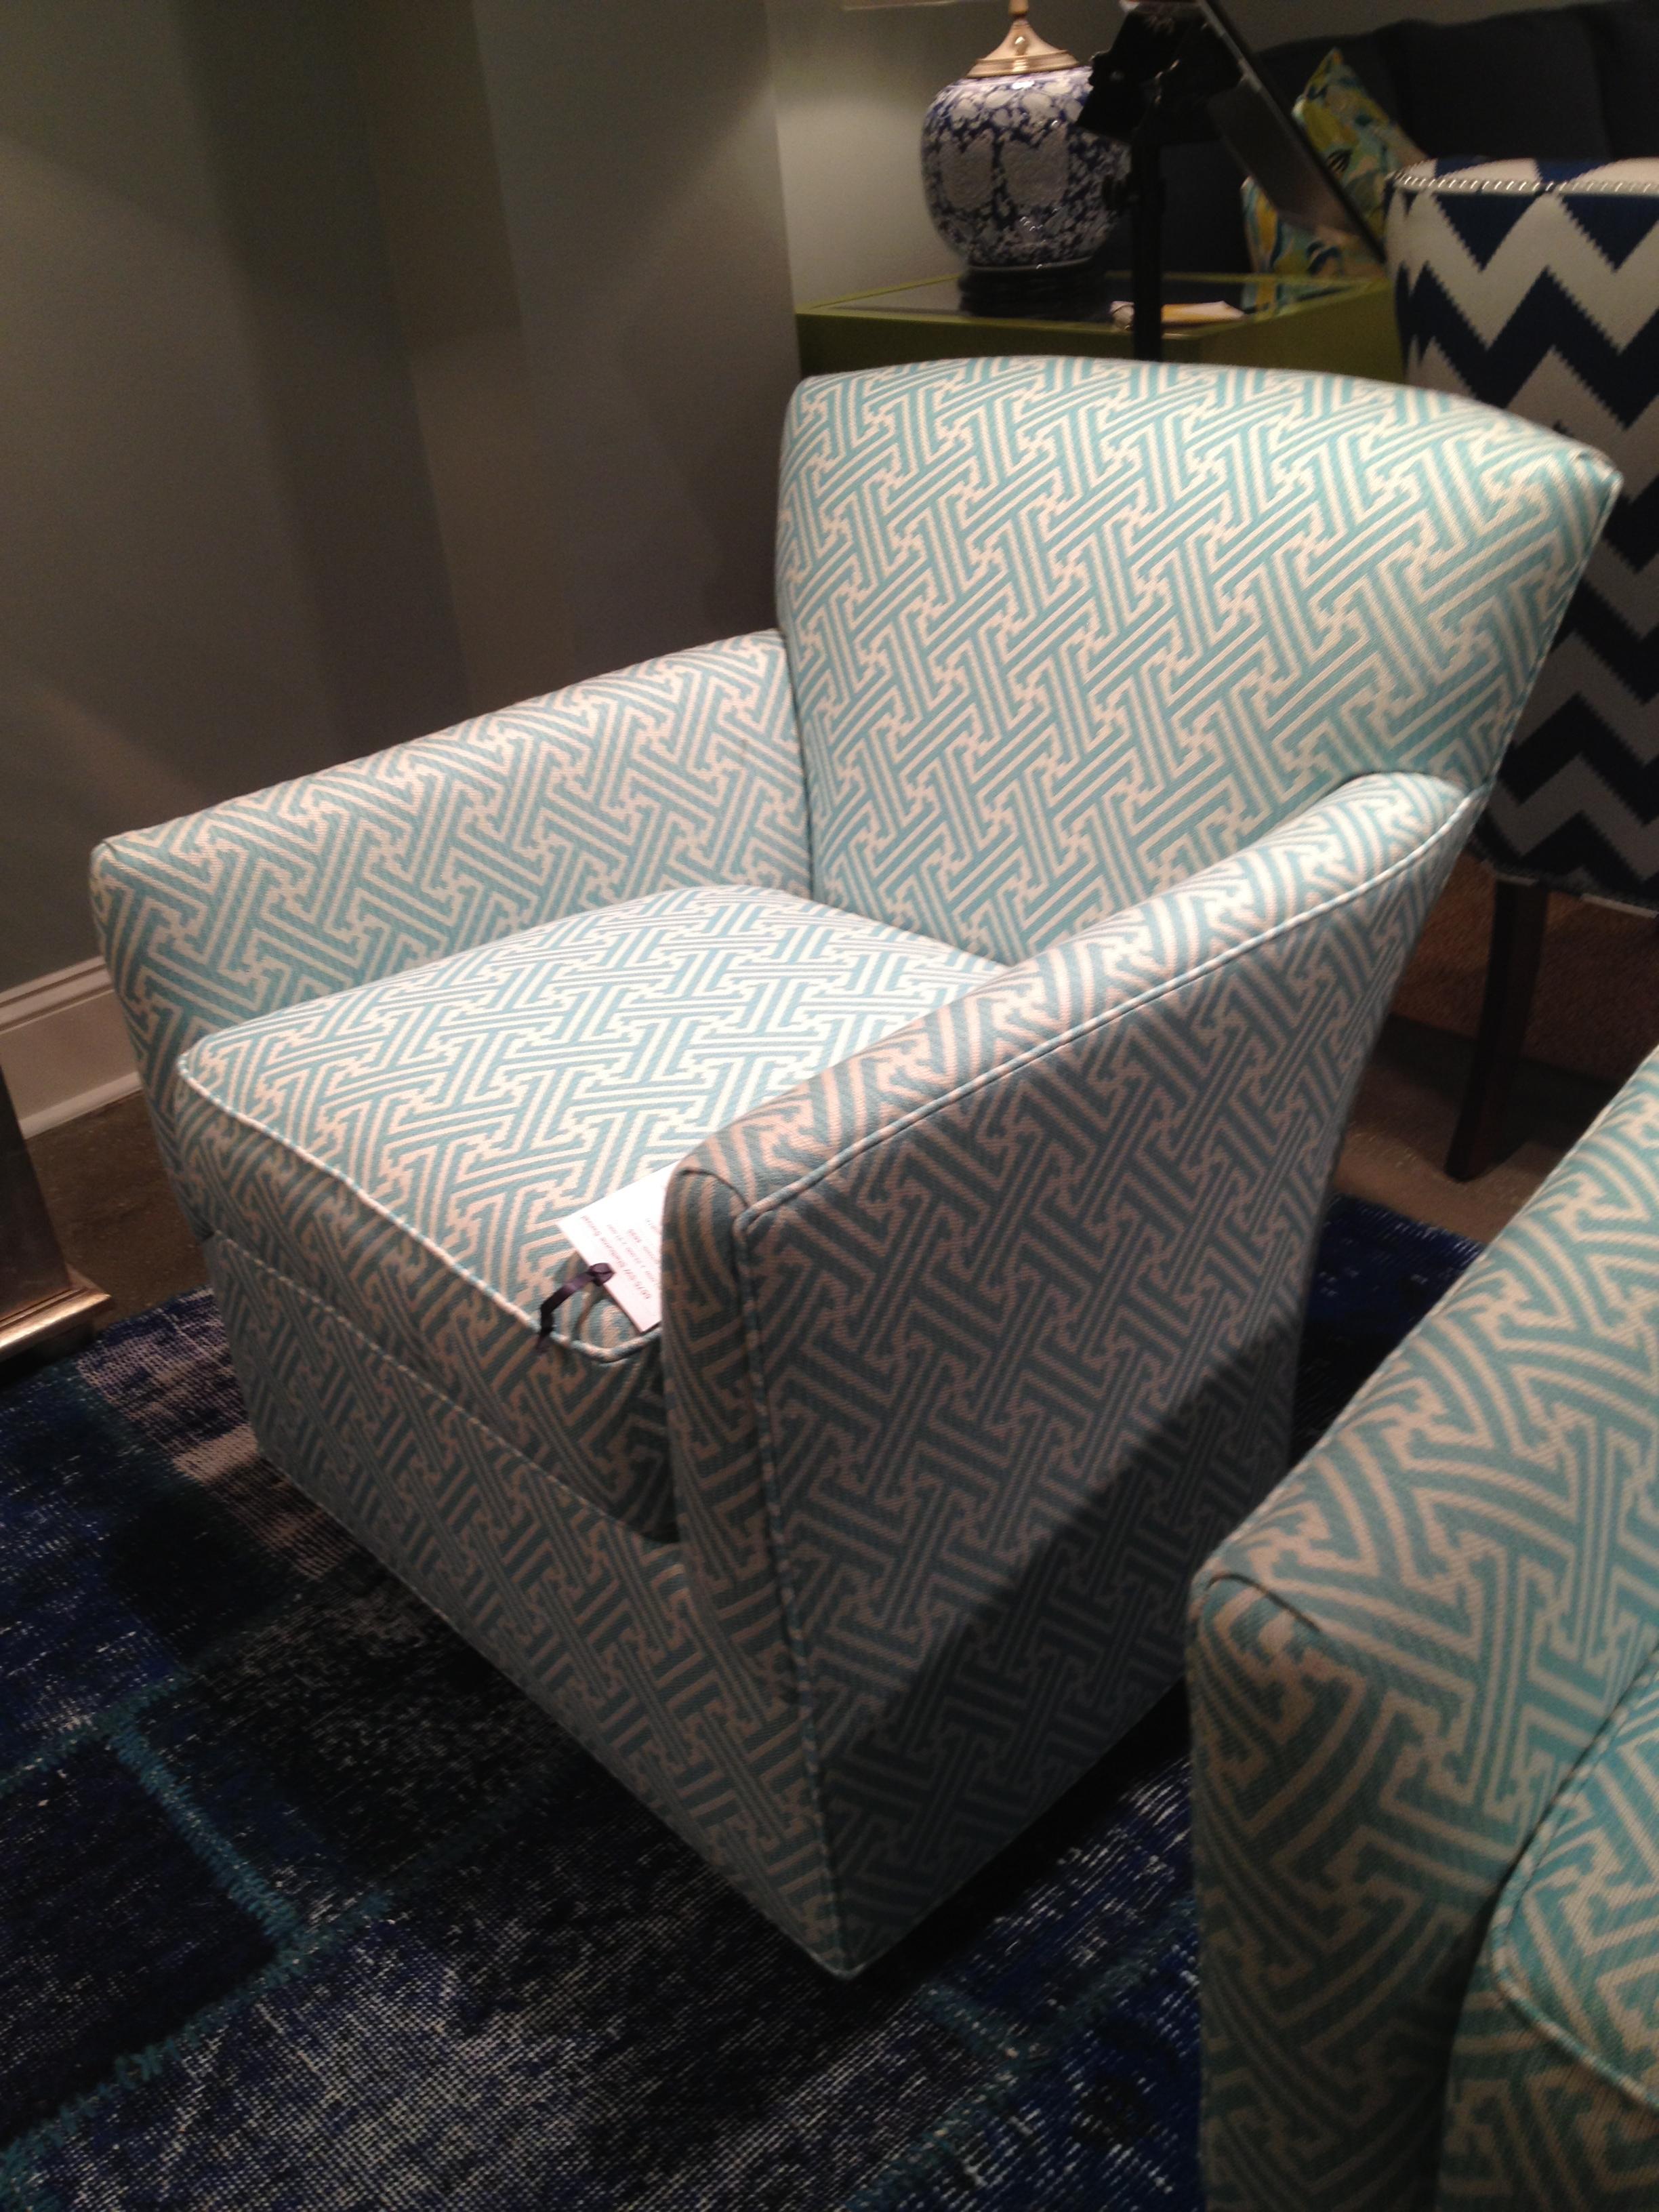 CR Laine Lounge Chair in Sunbrella